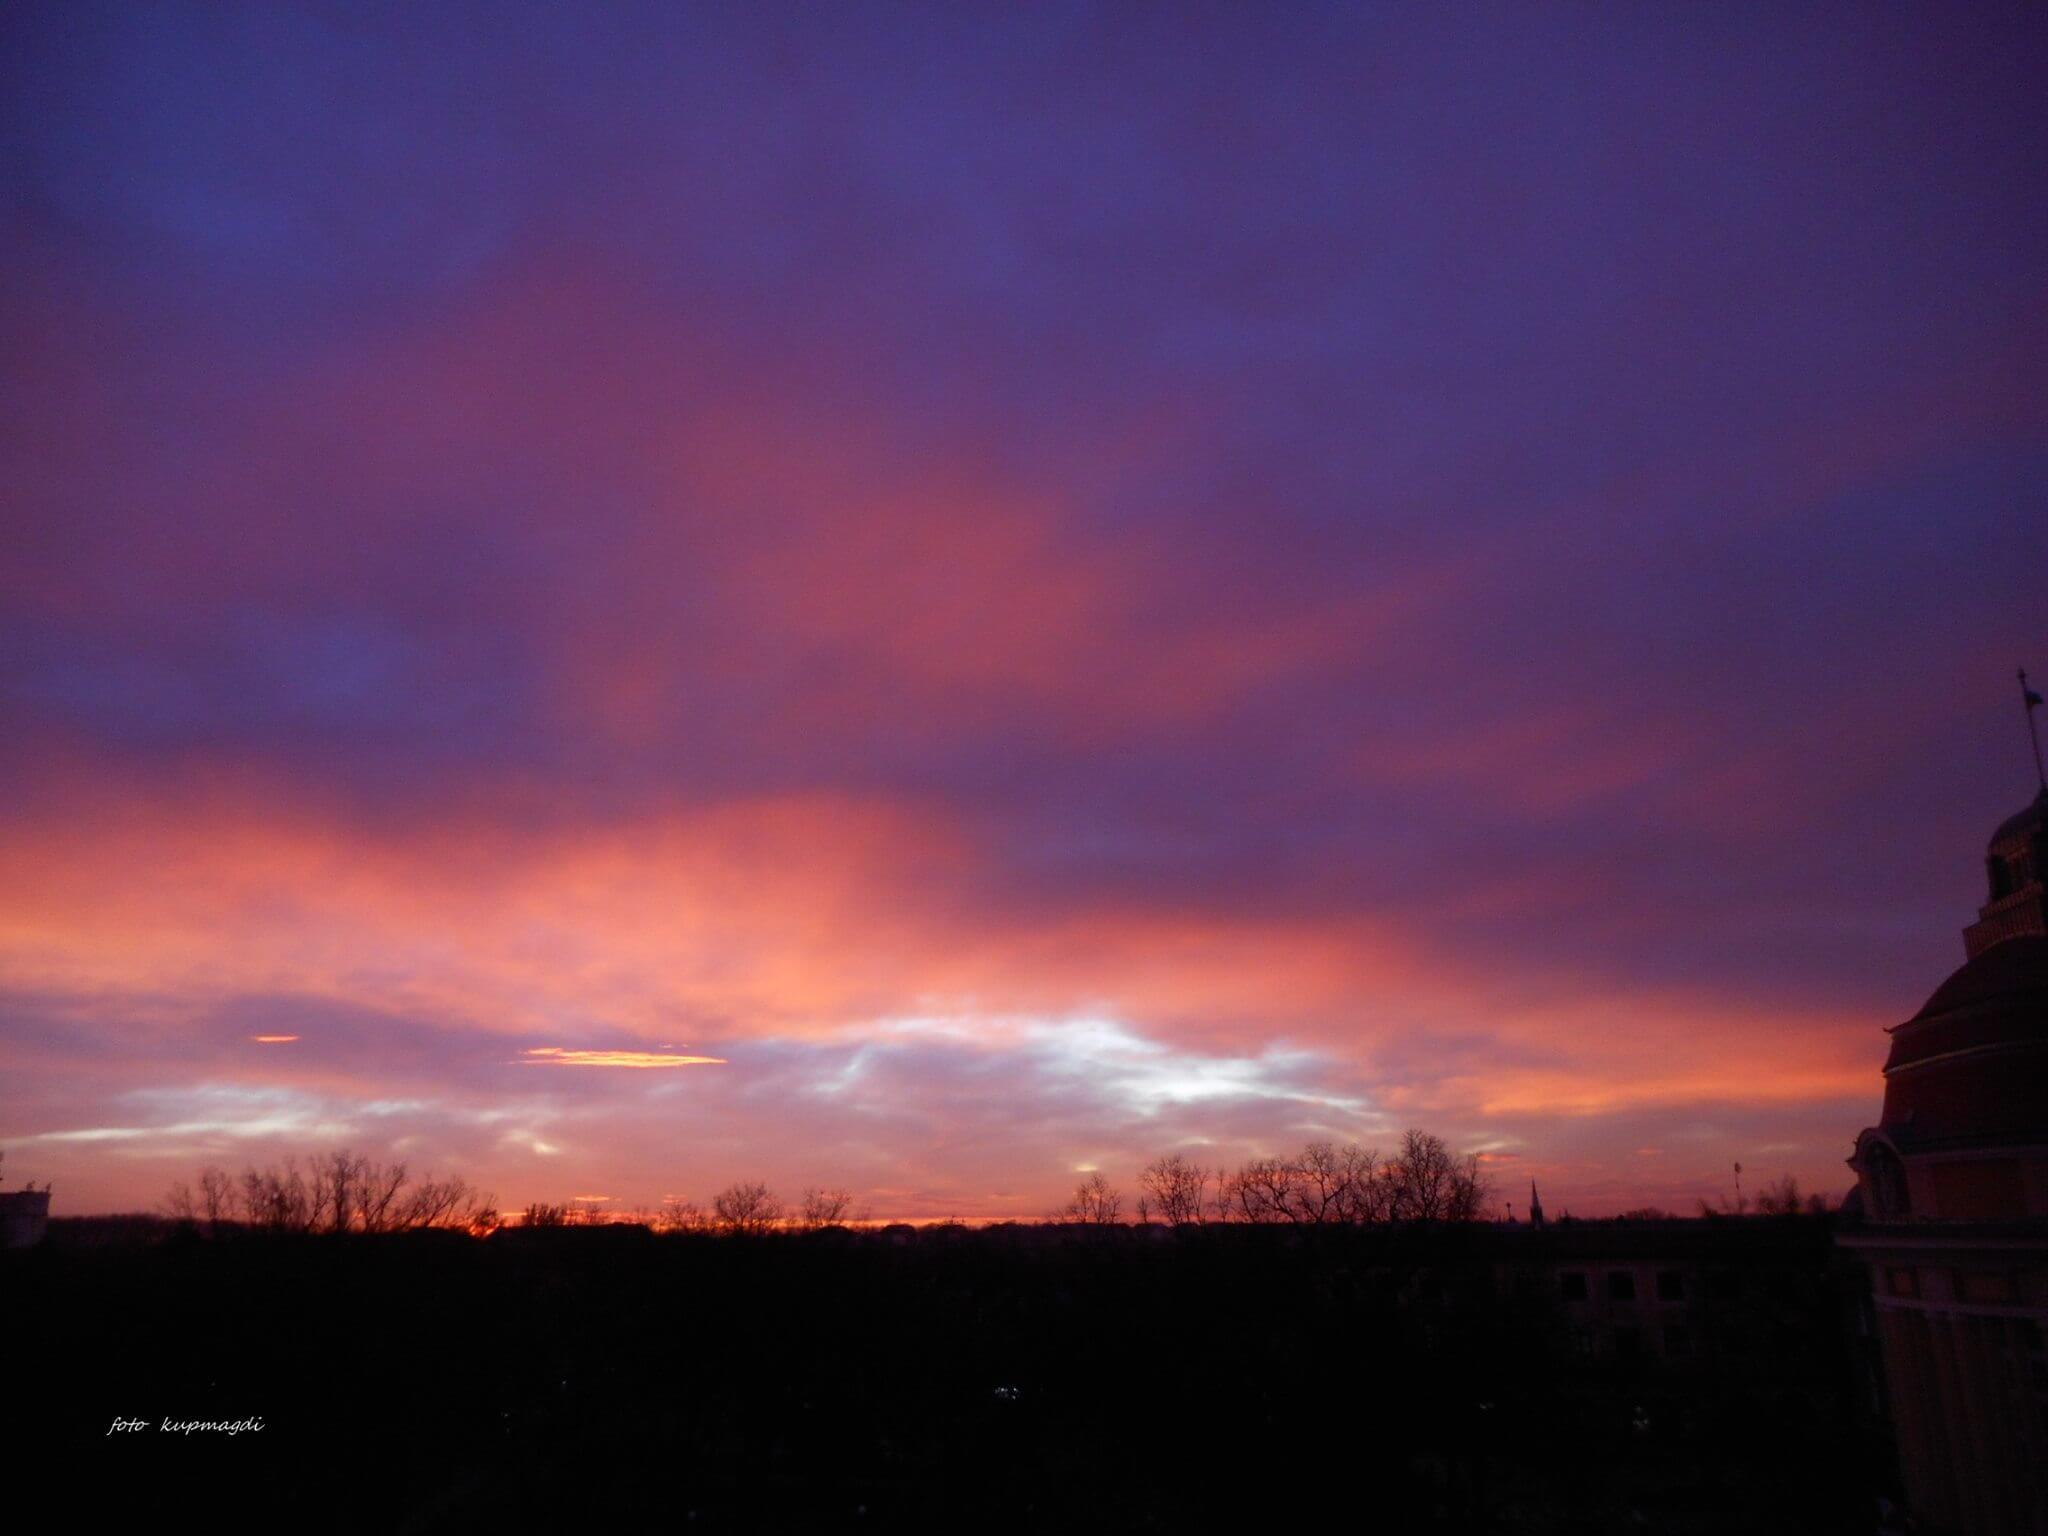 Izlazak sunca Senta - 12. dec (Foto: Magdolna Kuprešanin)